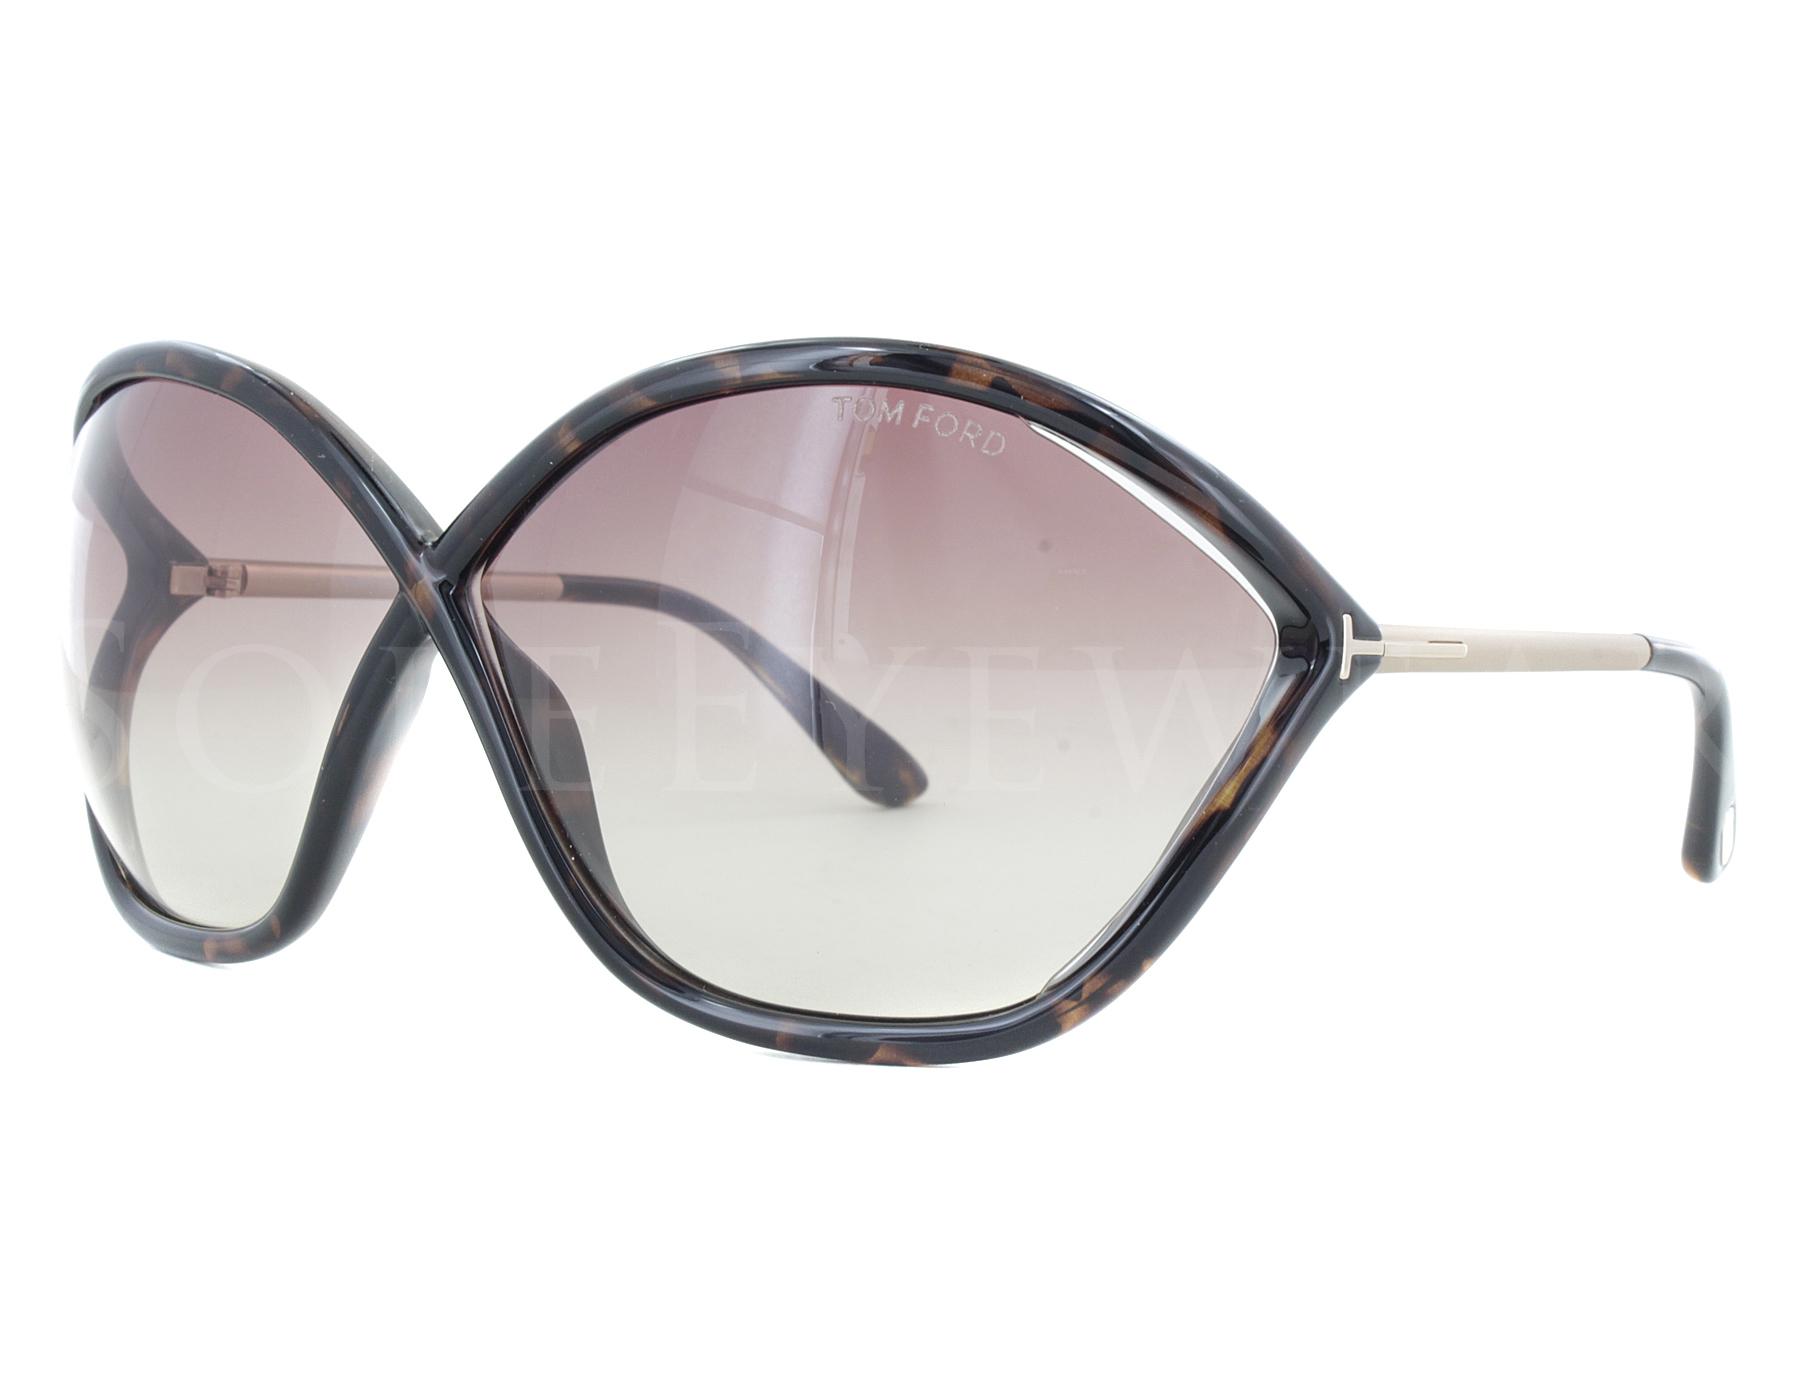 6c782aadc035 Details about NEW Tom Ford FT0529-52Z Bella Dark Havana   Violet Gradient  Sunglasses (NO CASE)